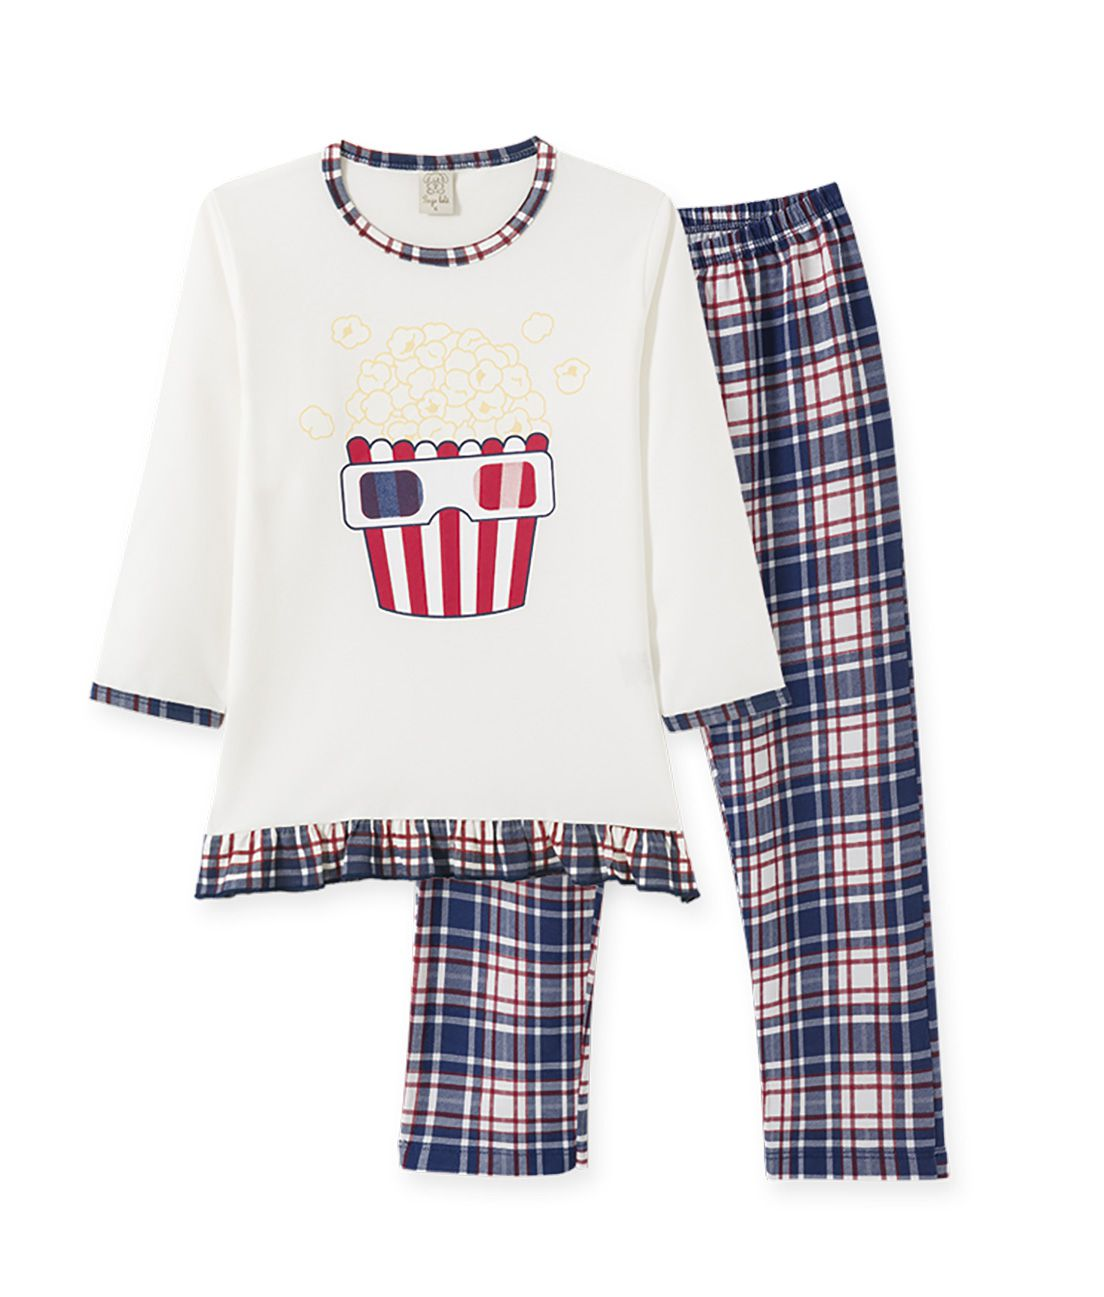 Pijama Pingo Lelê manga longa em meia malha  Pipoca Feminino Marinho/Xadrez